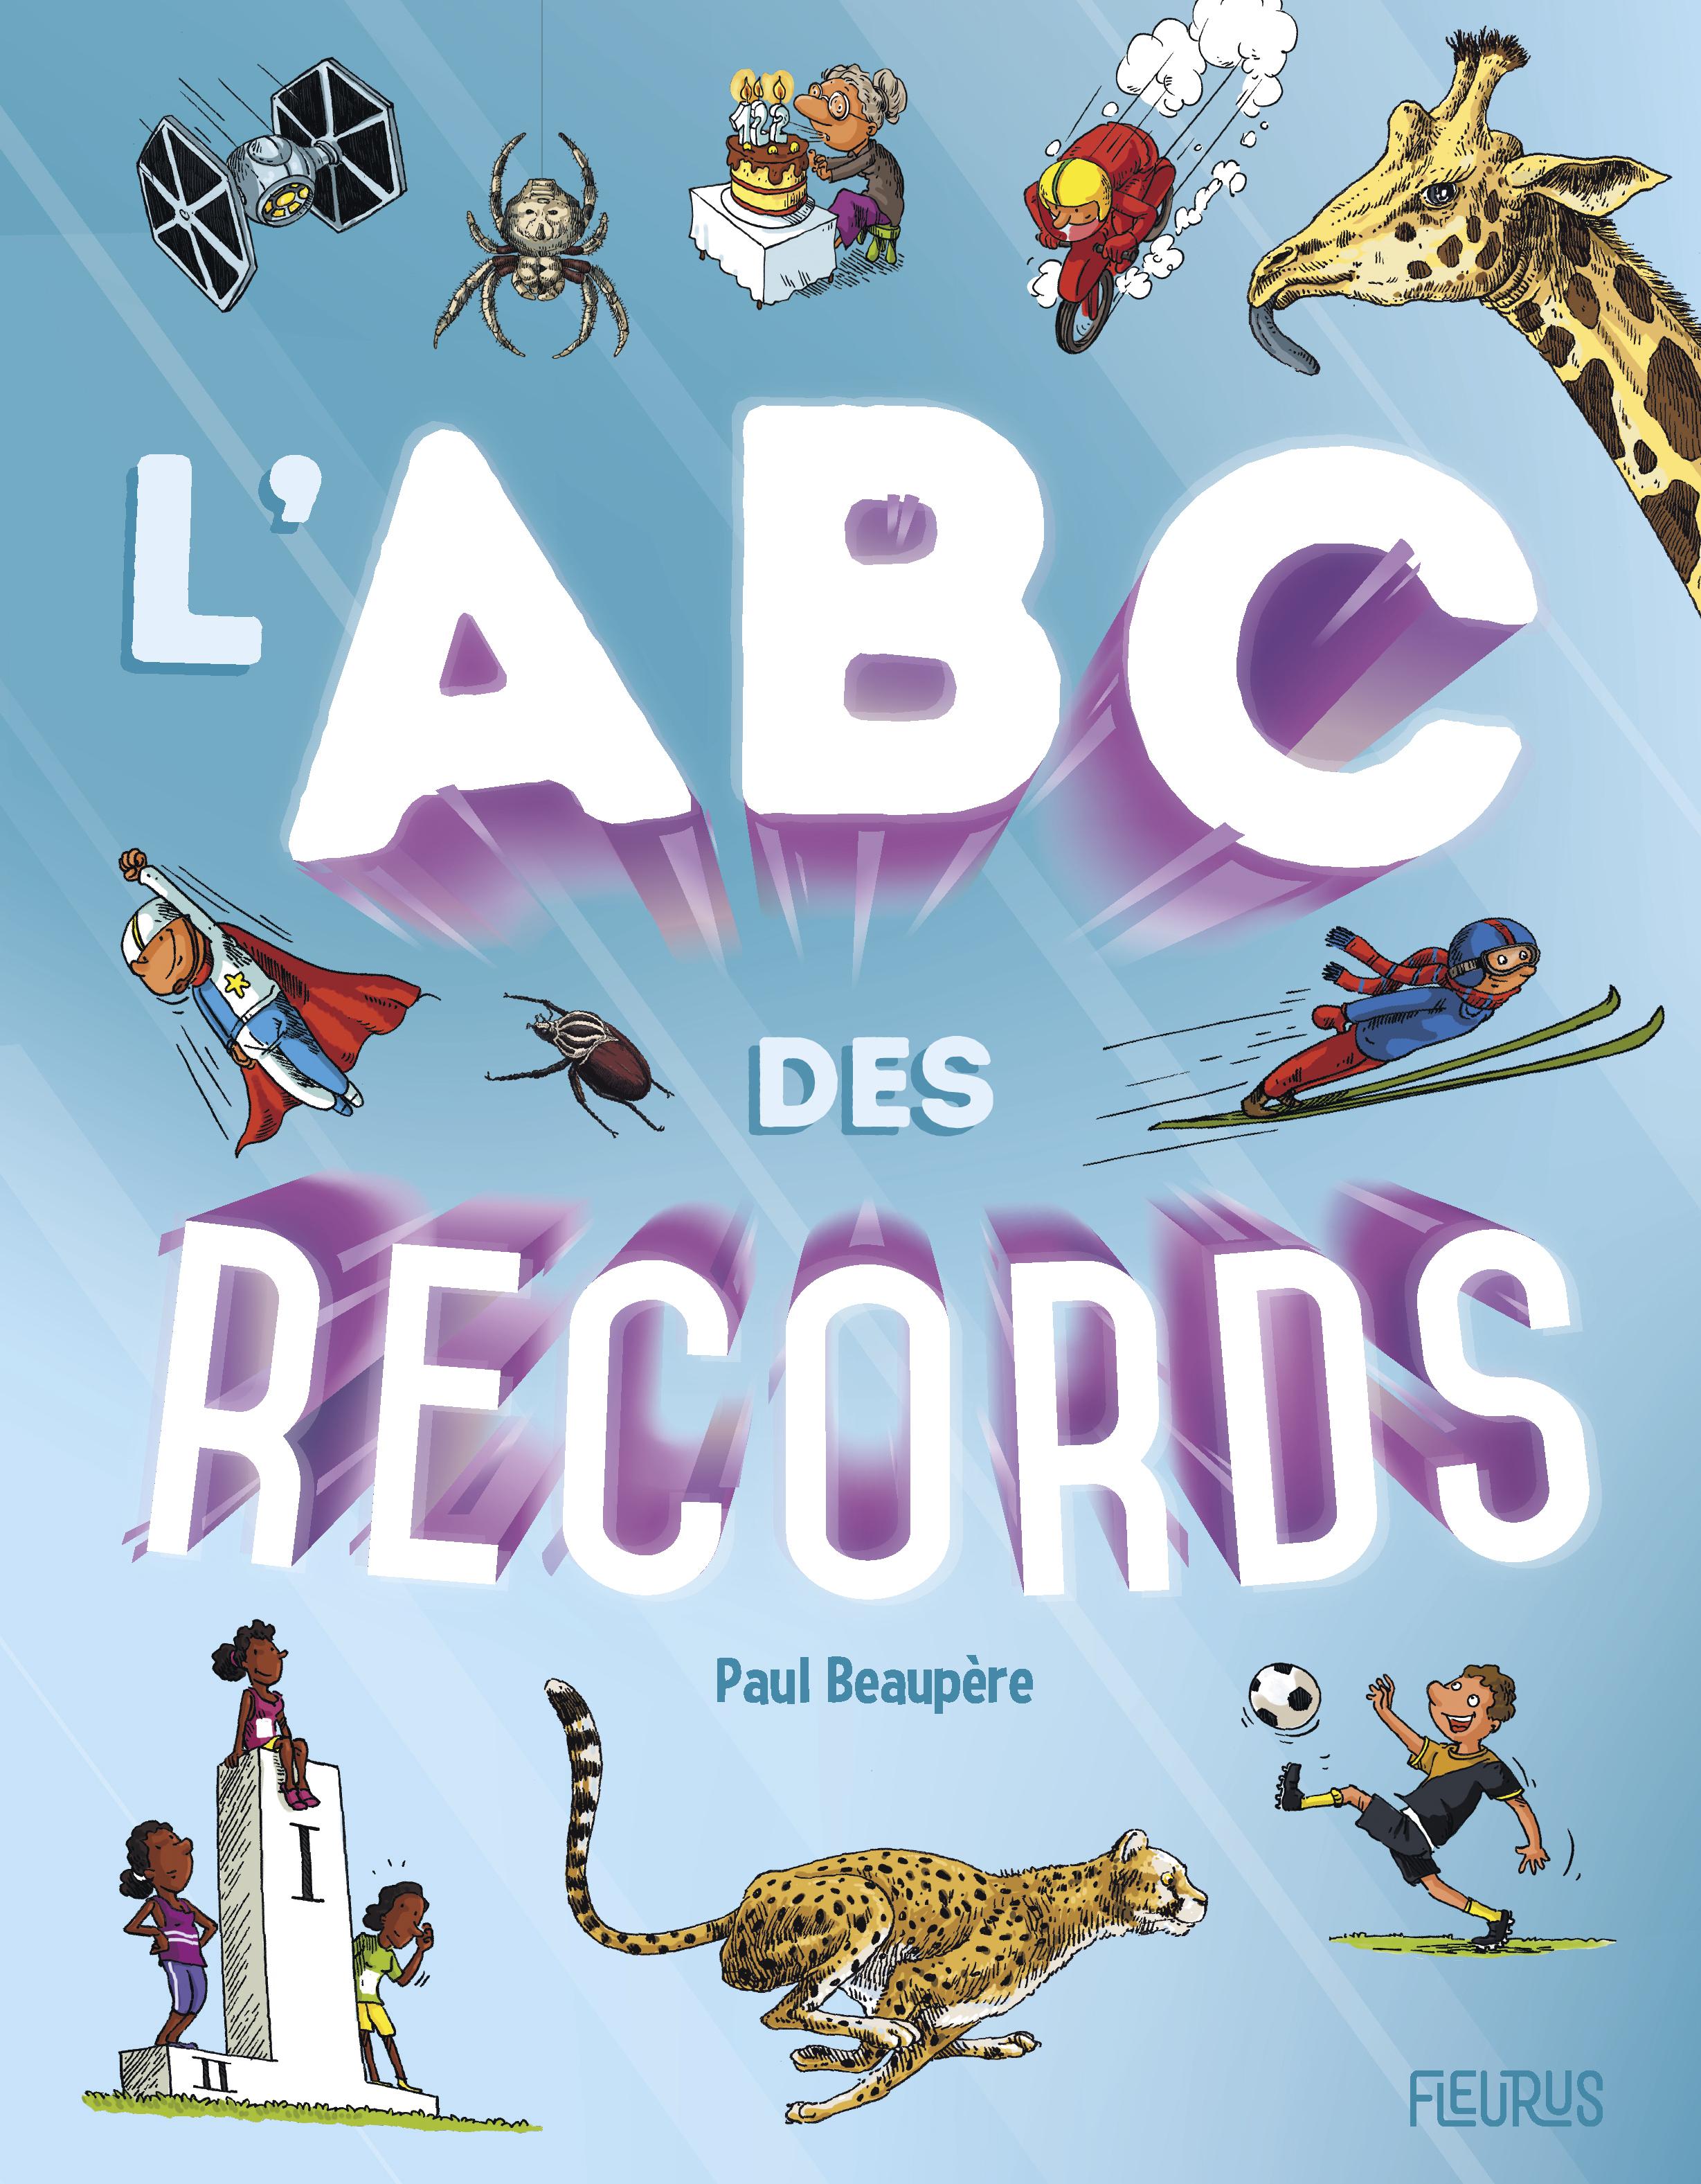 L ABC DES RECORDS